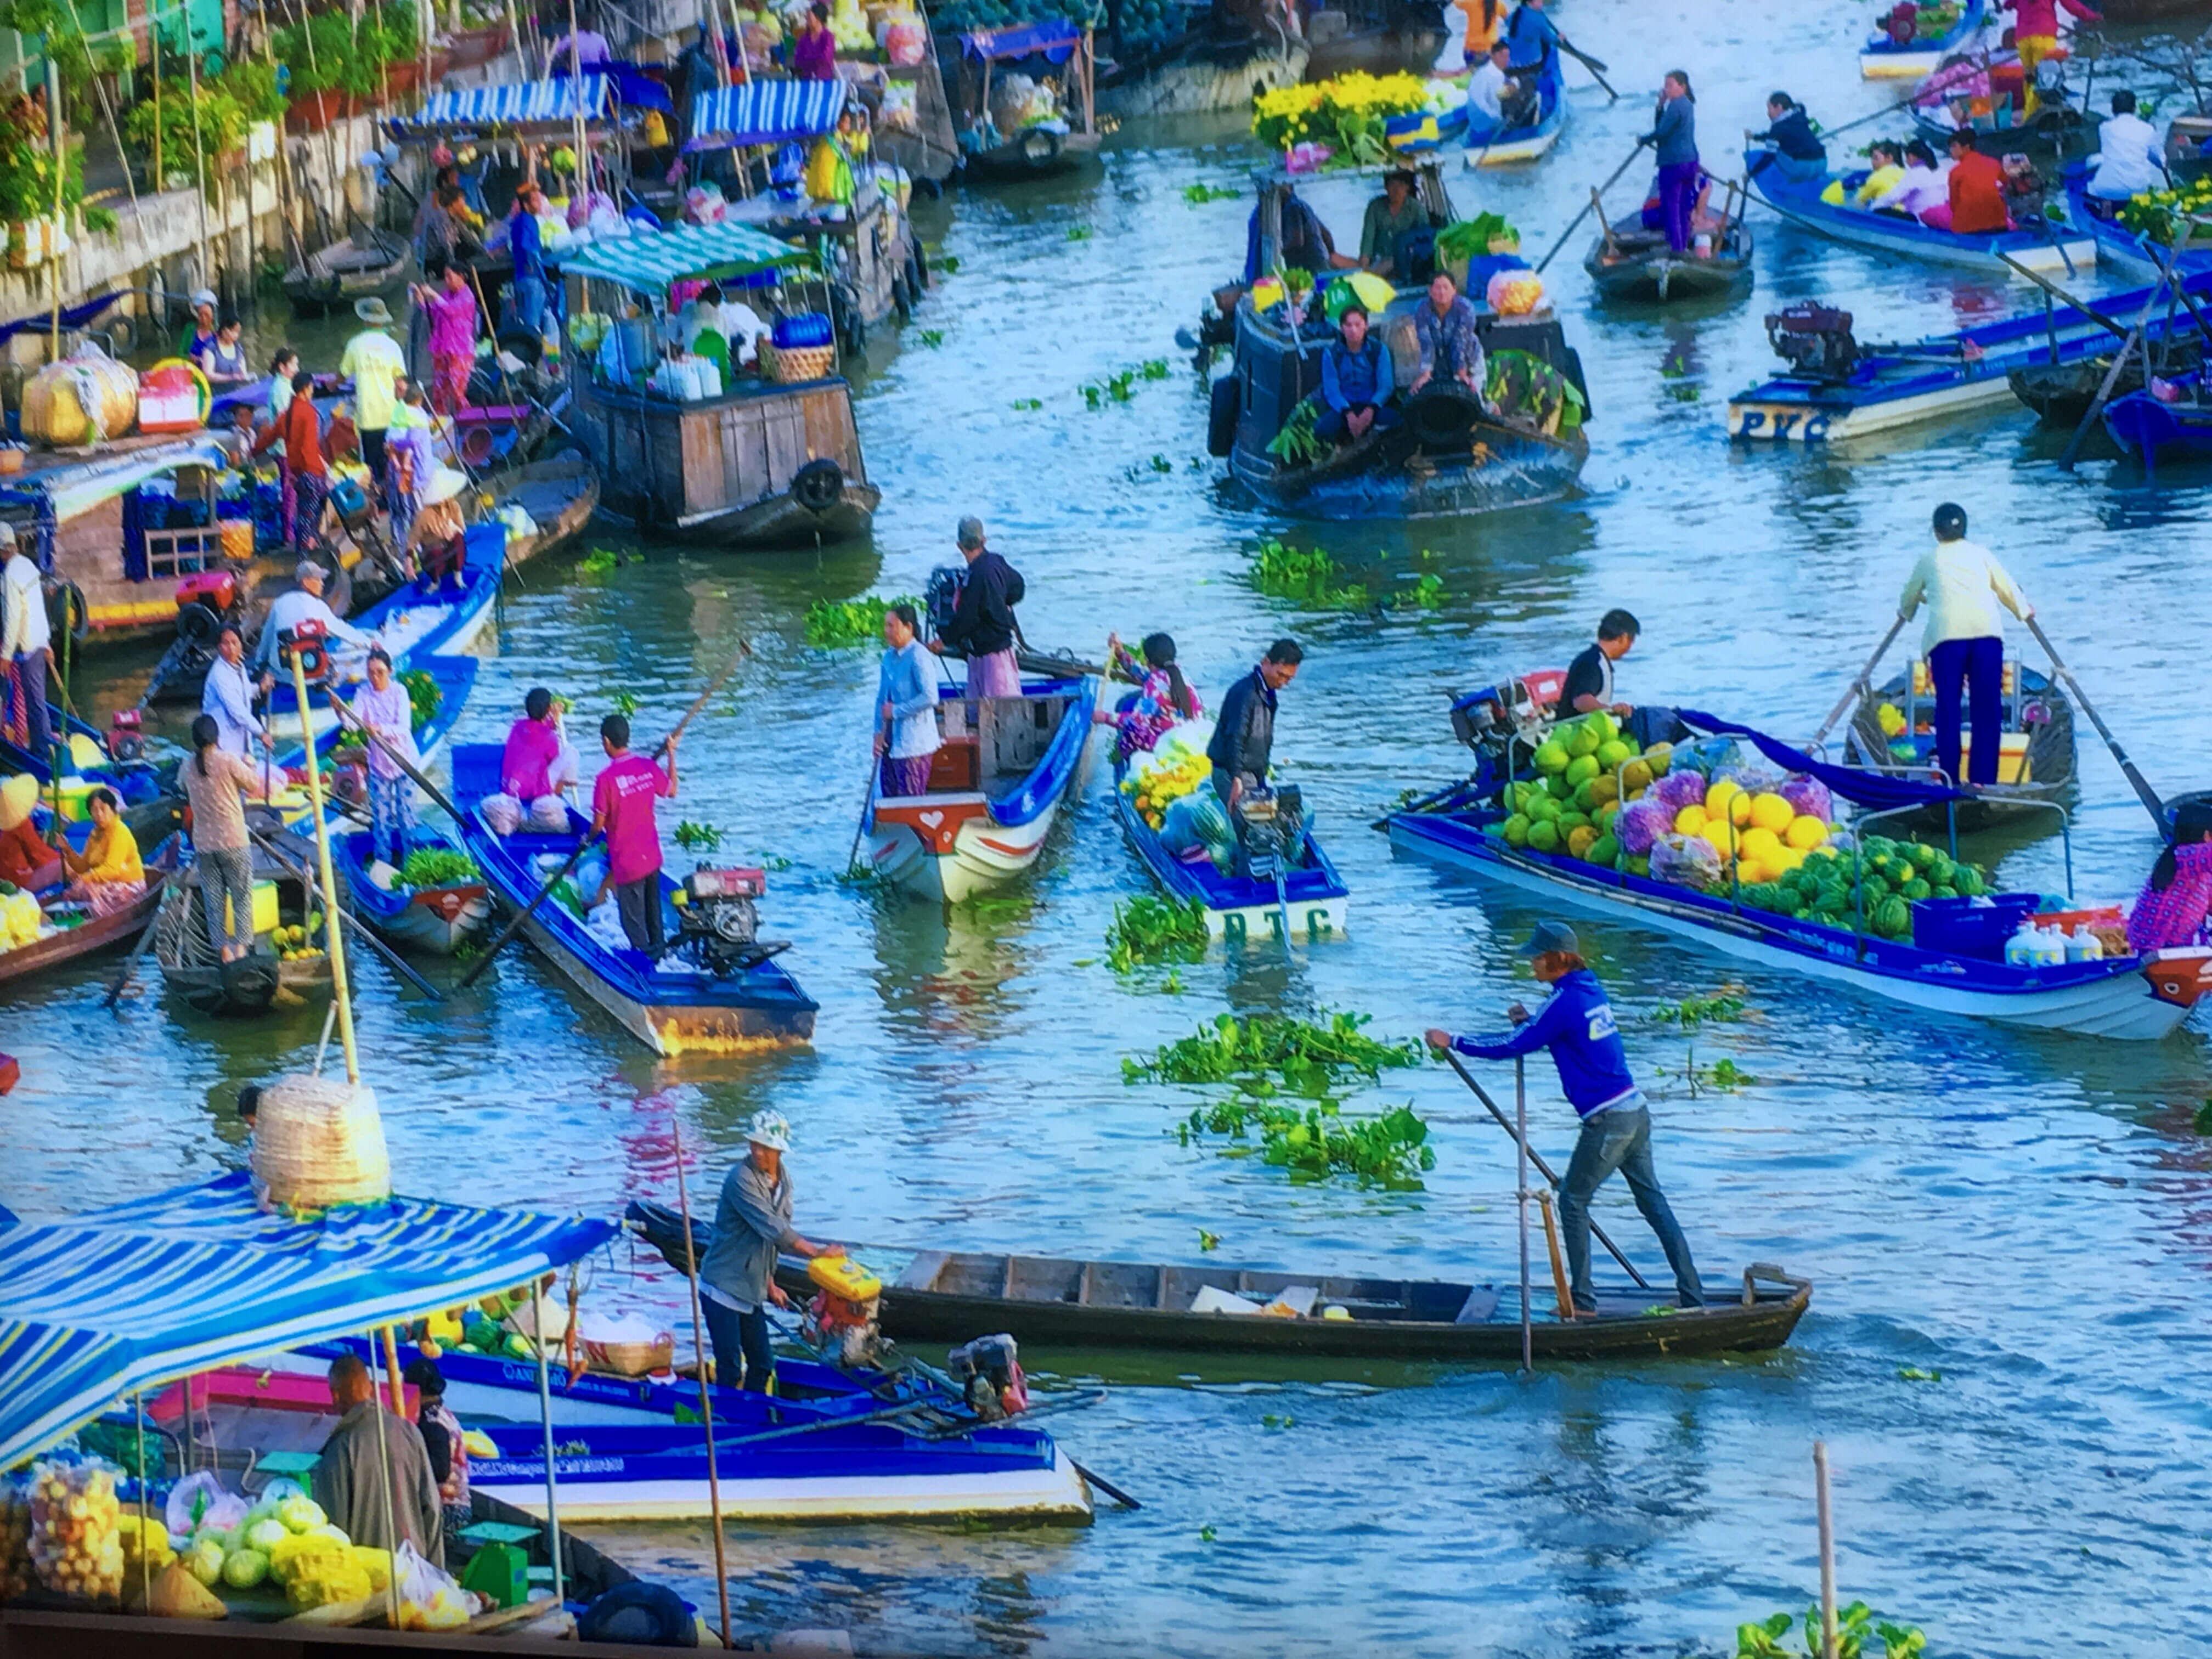 mekong delta - best places to visit Vietnam in September